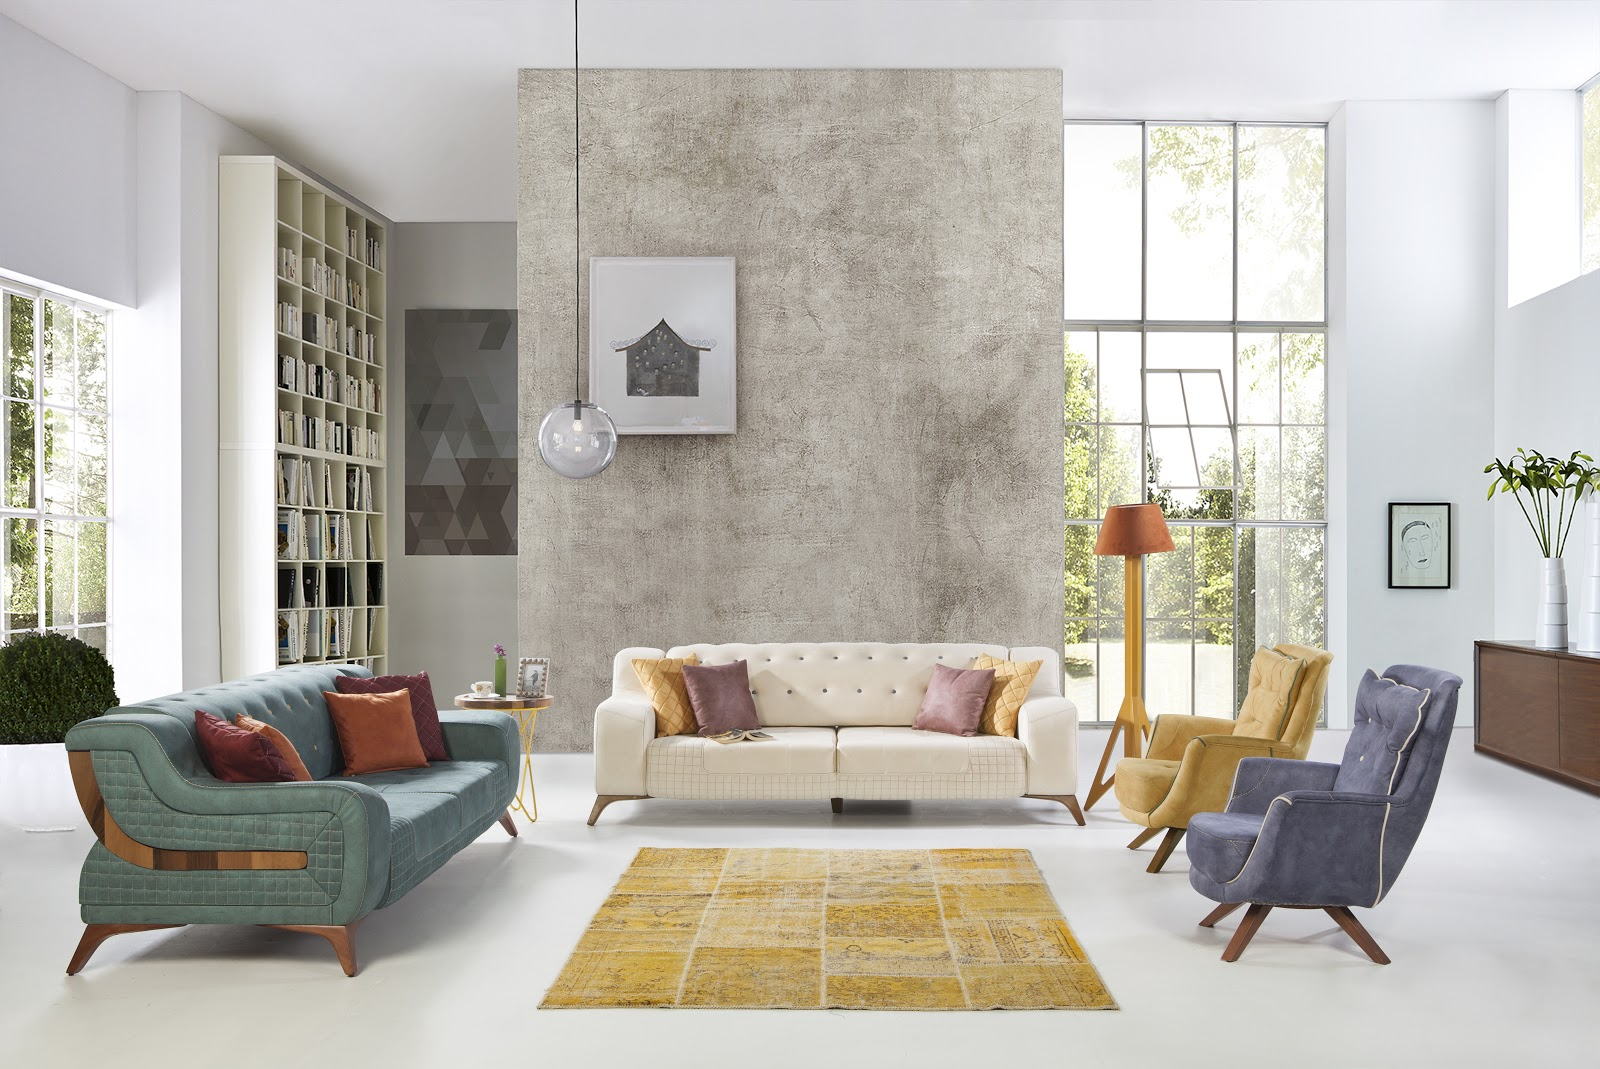 negative space in interior design